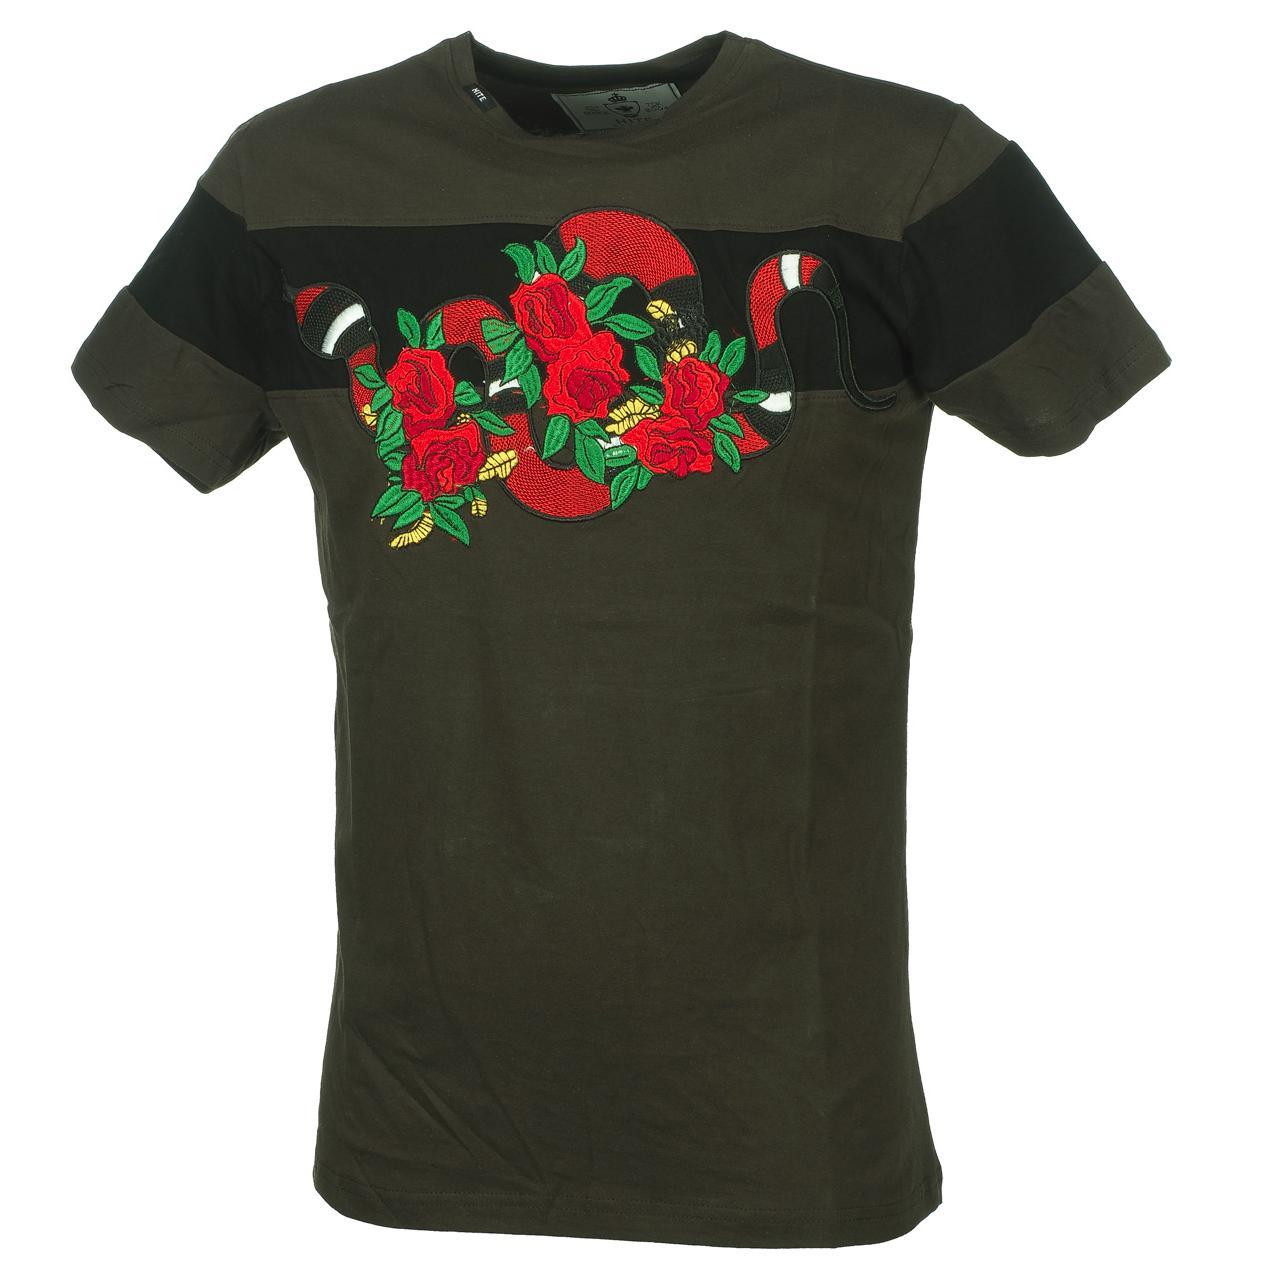 Short-Hite-Couture-Mixer-Kakiblack-Mc-Tee-Green-11537-New